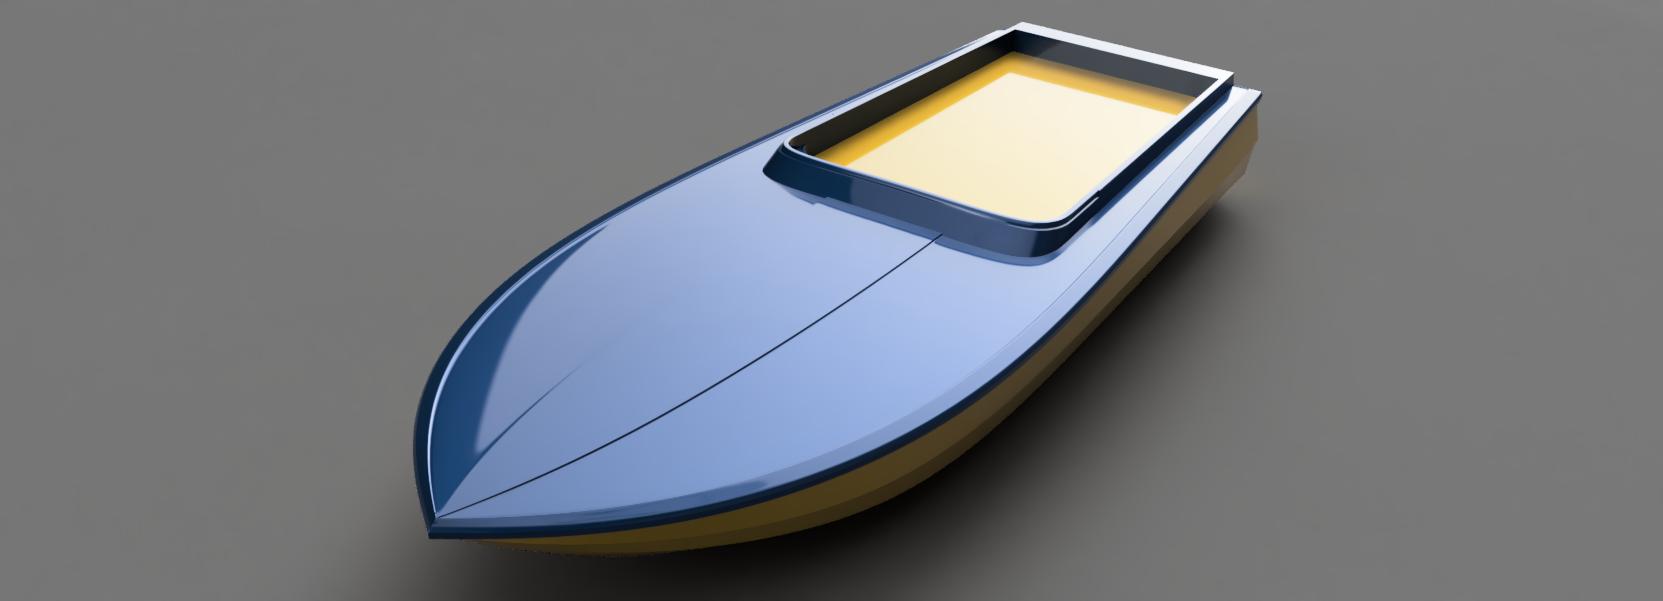 3D digital render of a racing boat – 1